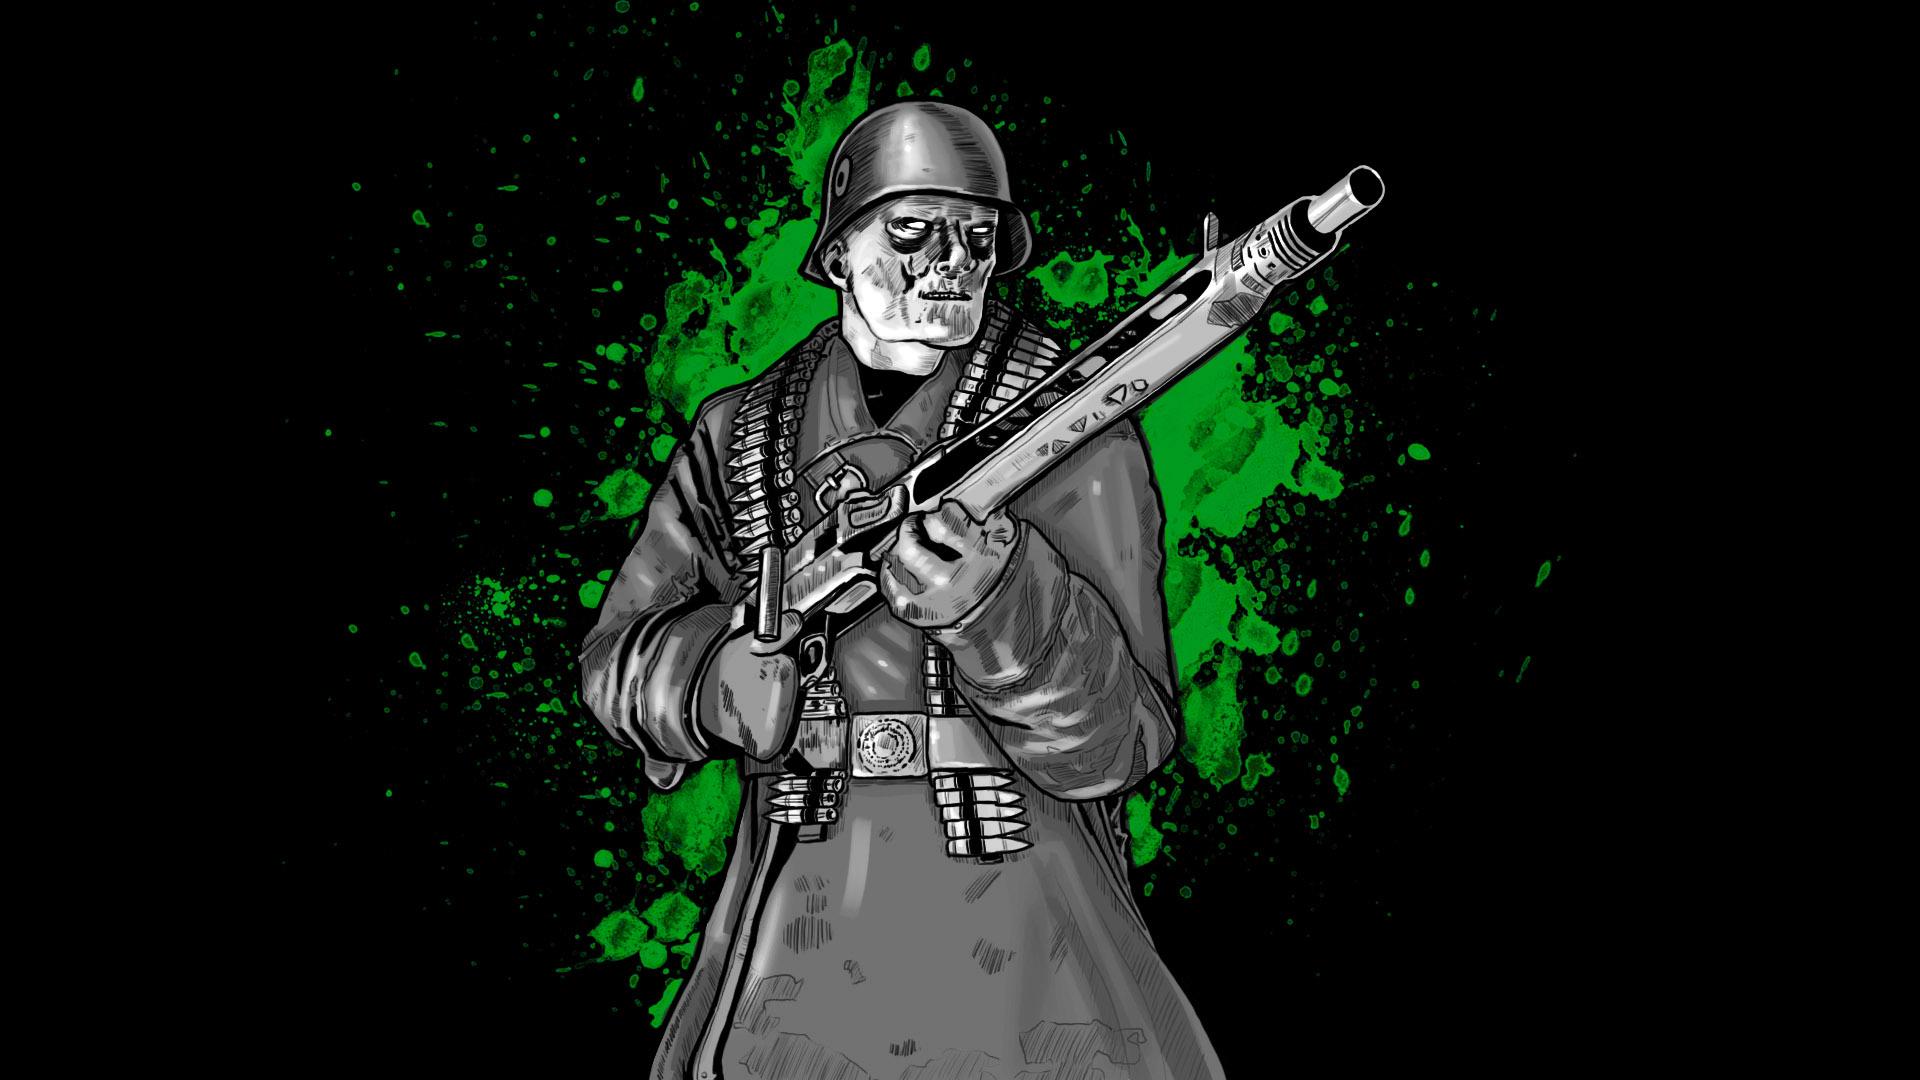 Sniper Elite Nazi Zombie Army Artwork 7.jpg